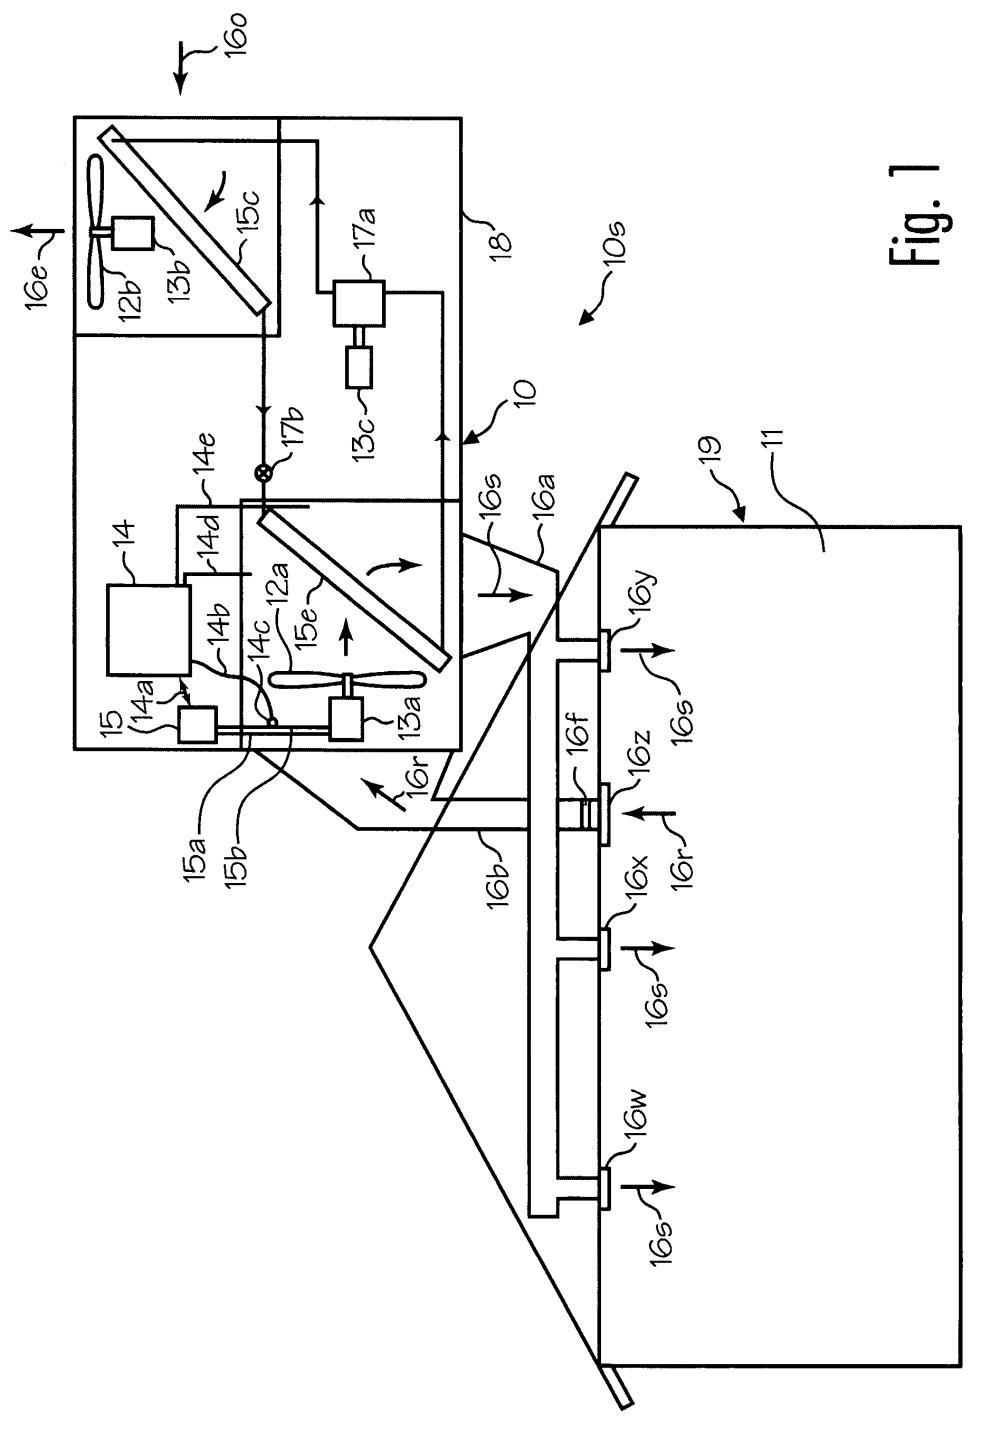 medium resolution of heil 7000 furnace control wiring diagram heil free durapack wiring diagrams heil ac wiring diagram